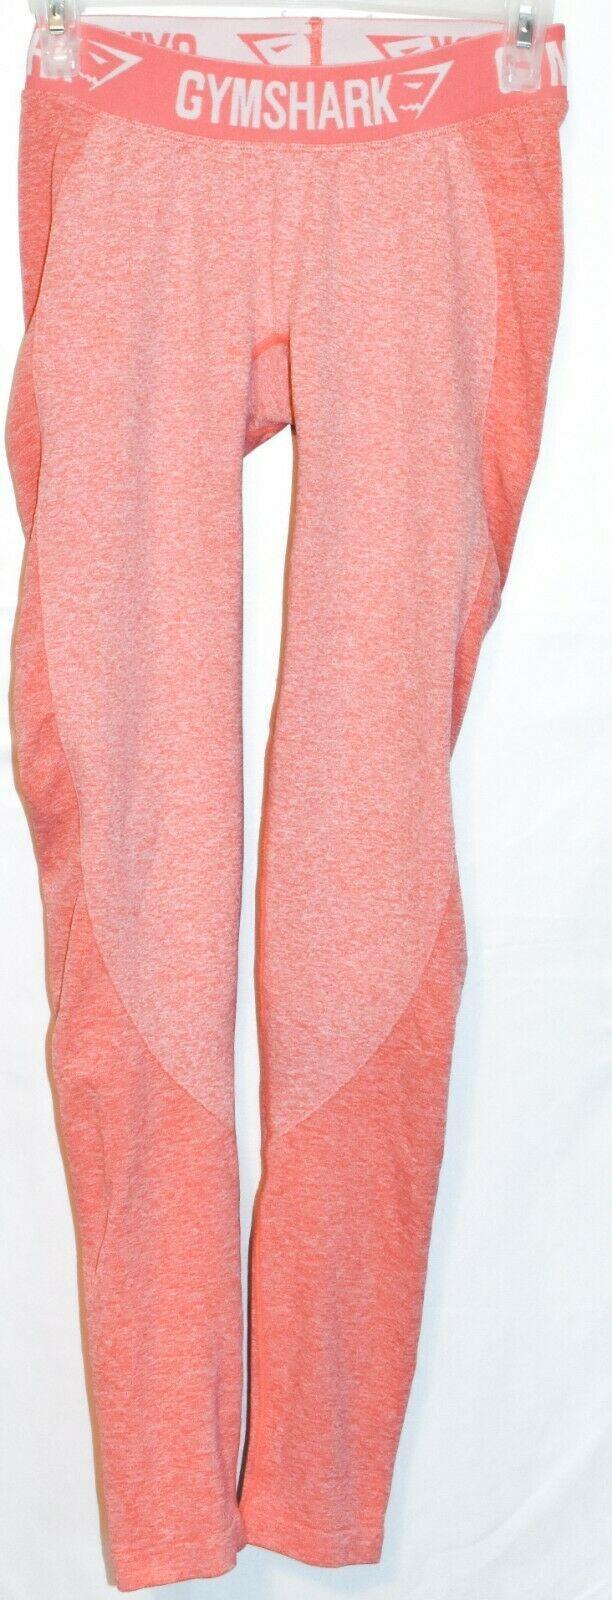 Gymshark Women's Marl Peach Pink Flex Low Rise Body Contouring Leggings Size S